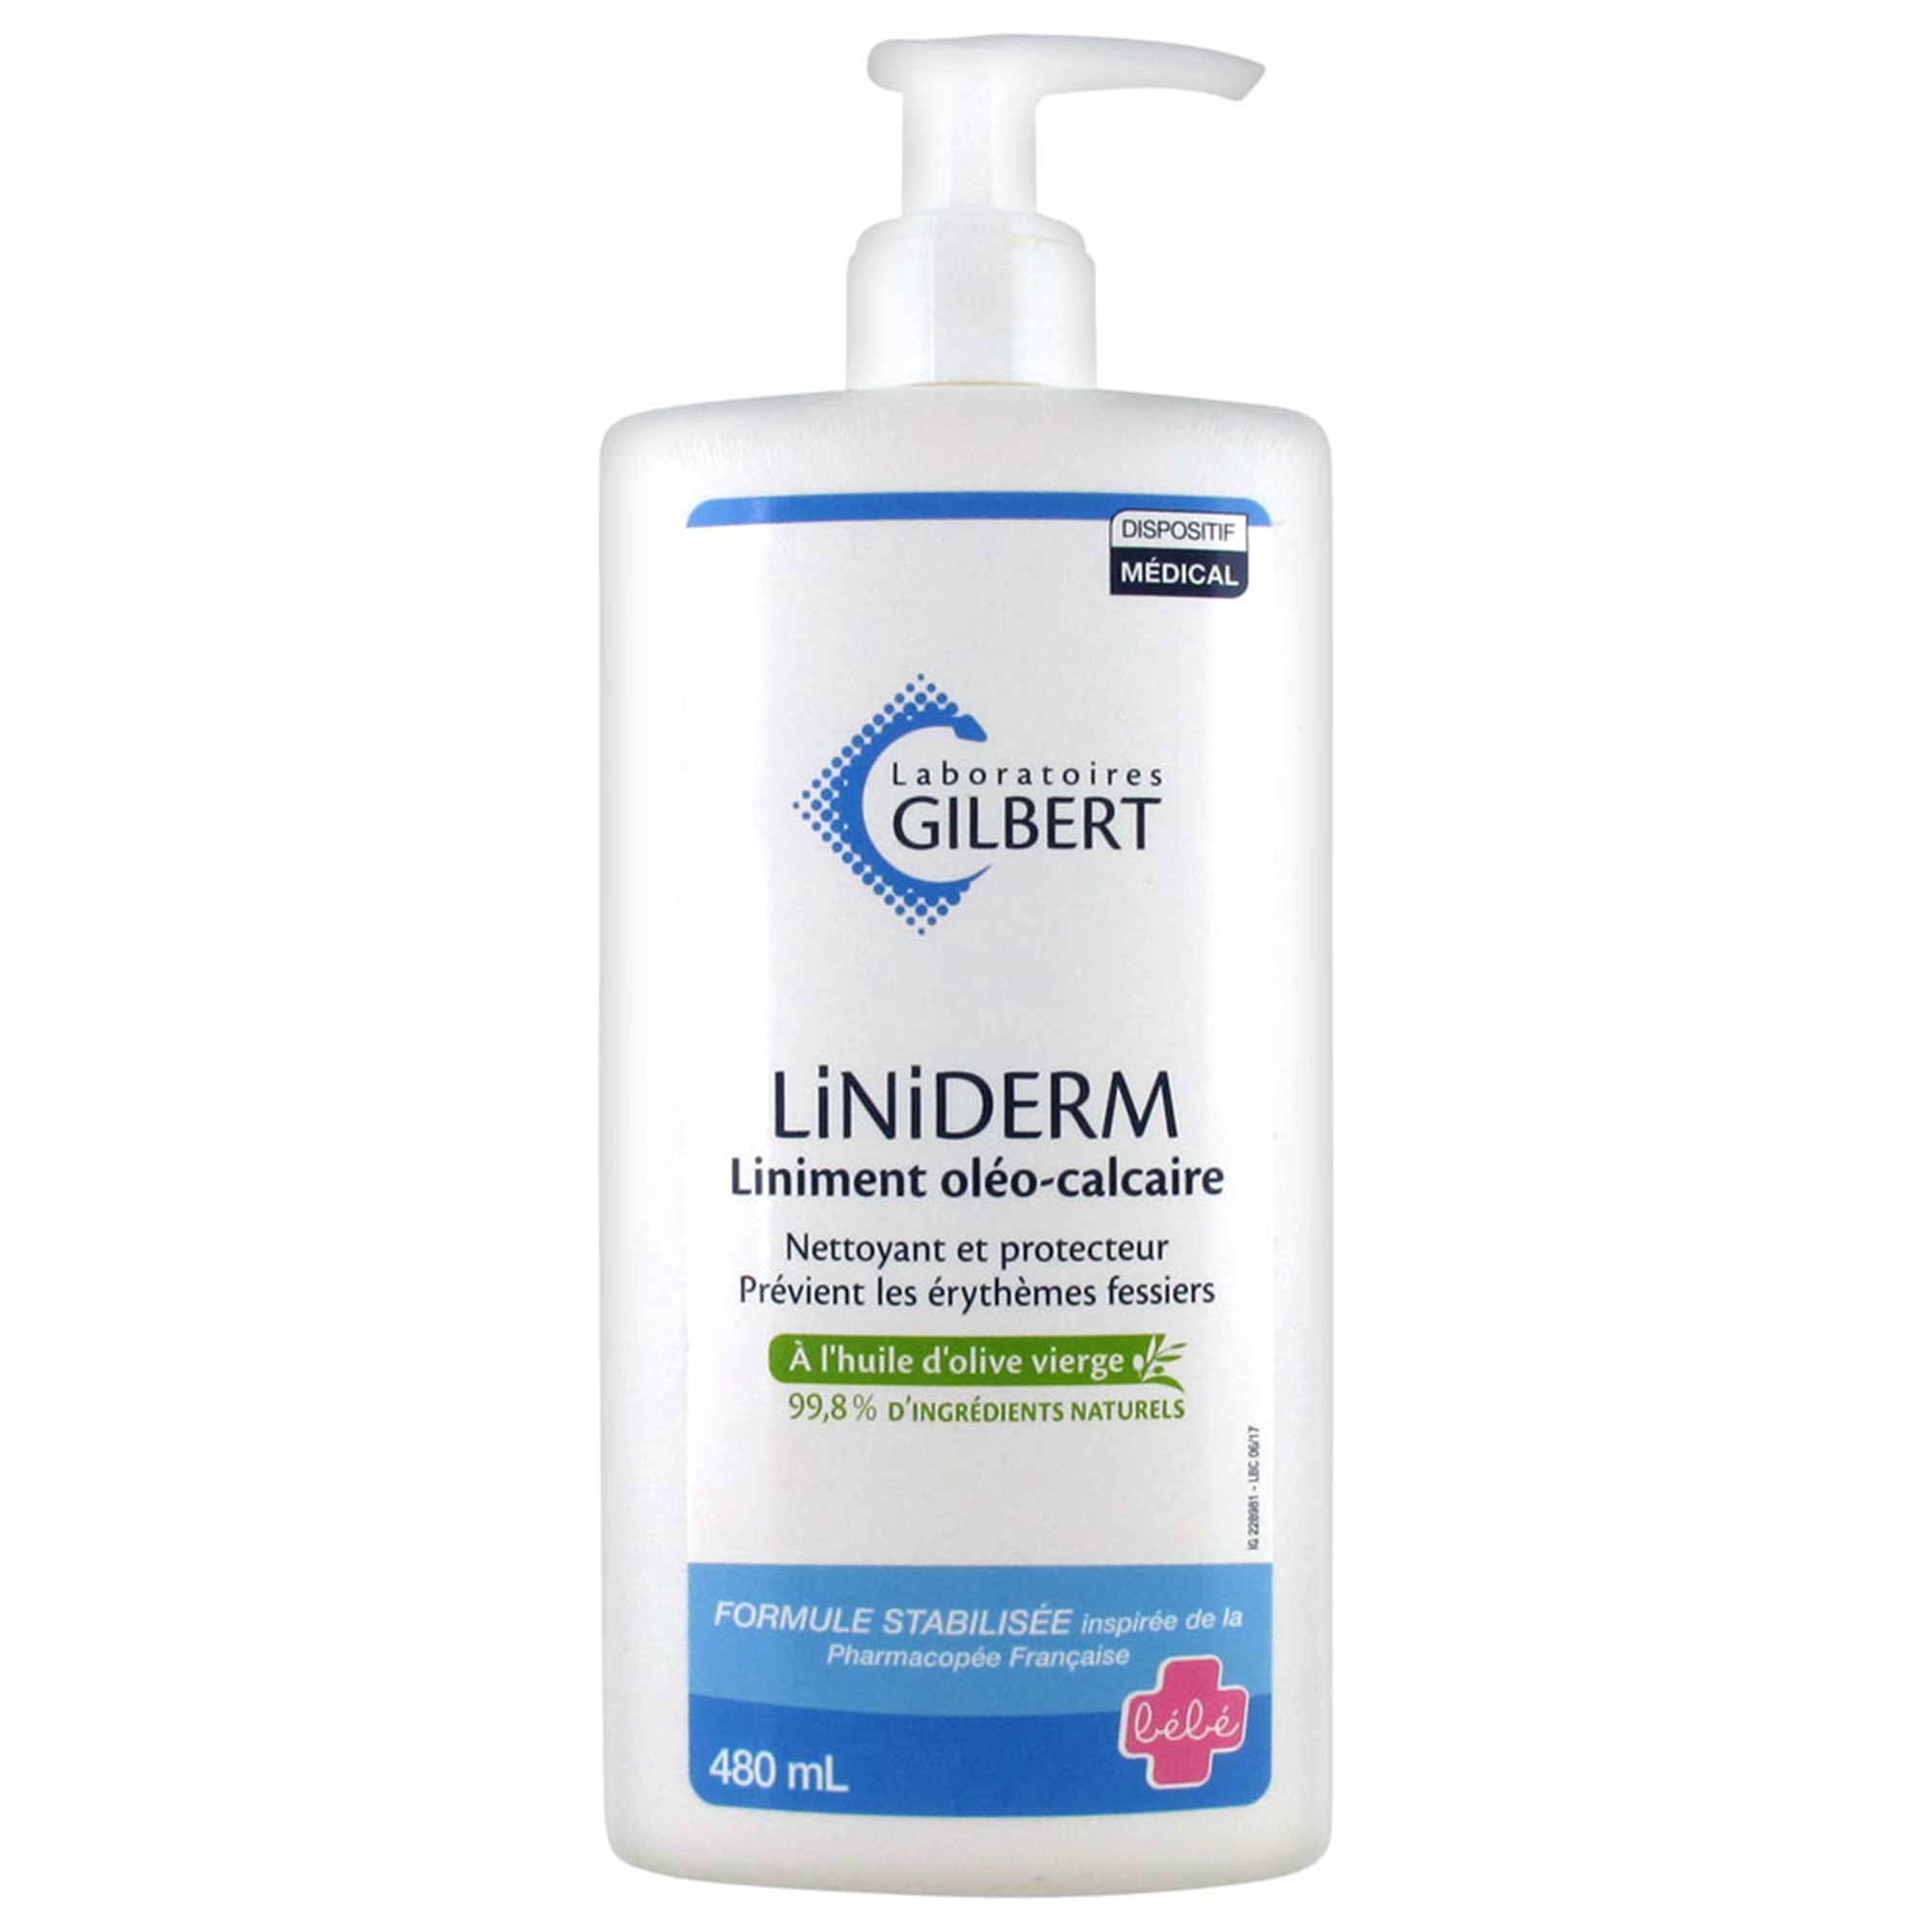 Crema scutec, Liniderm, Gilbert Laboratoires, 480 ml, cu pompita